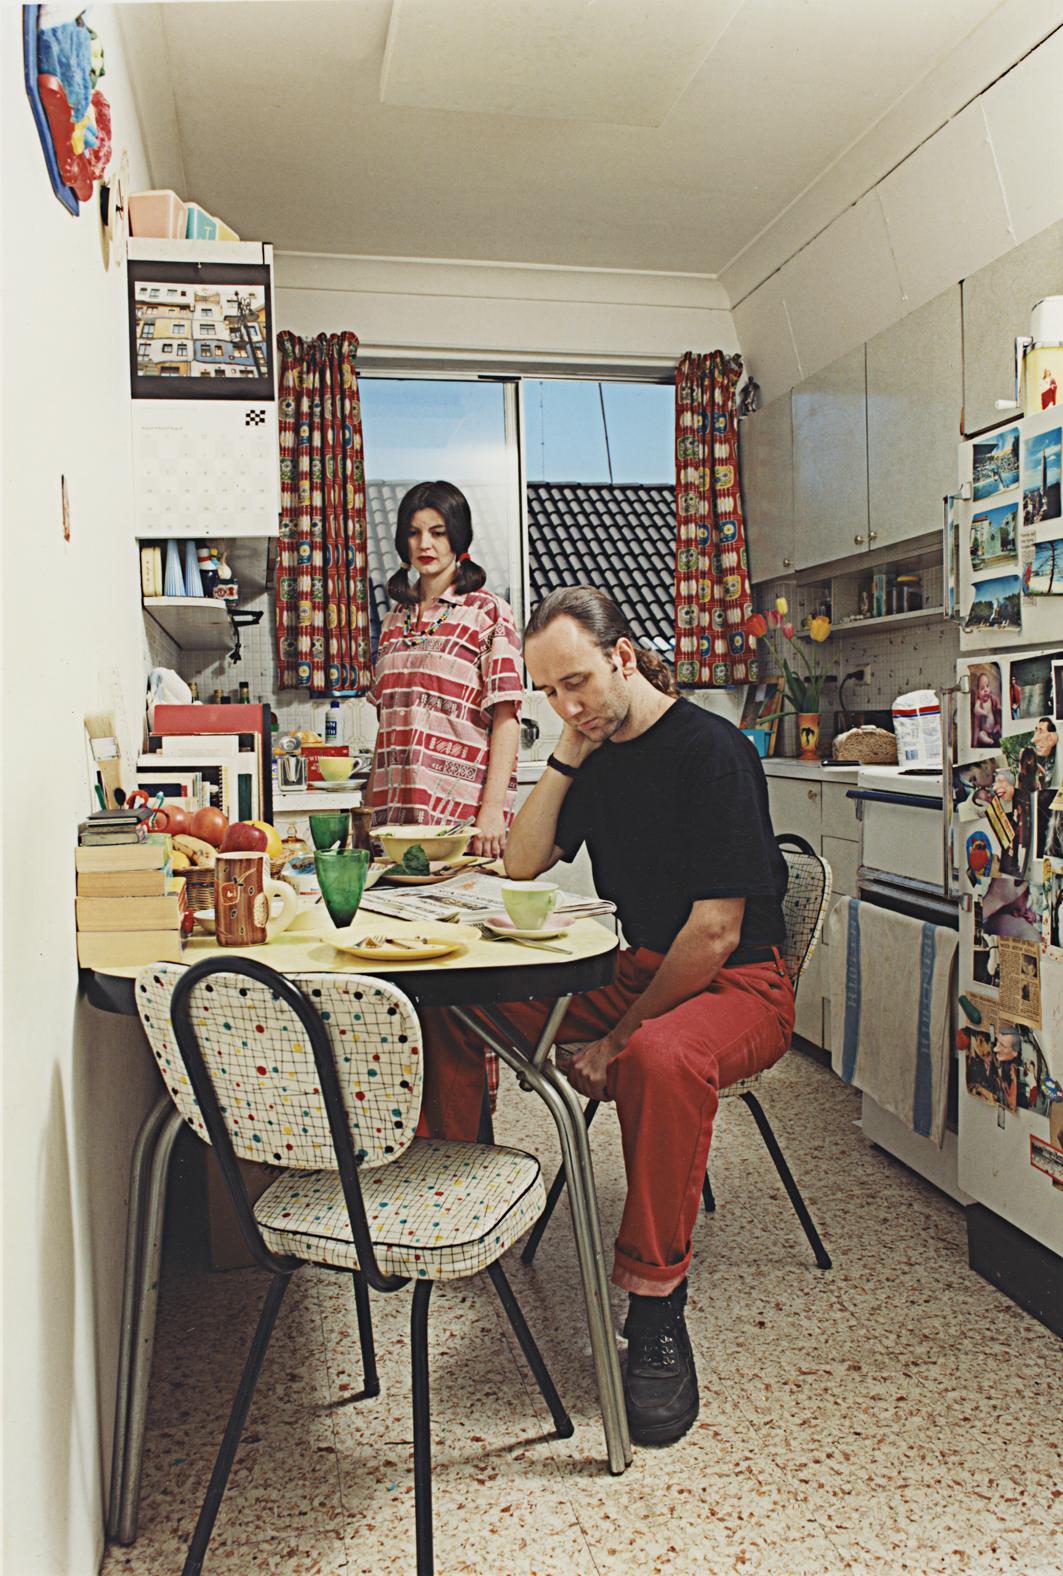 ANNE ZAHALKA   Sunday, 2:48 pm  1995 Duratran and Lightbox 173 x 125 x 25 cm